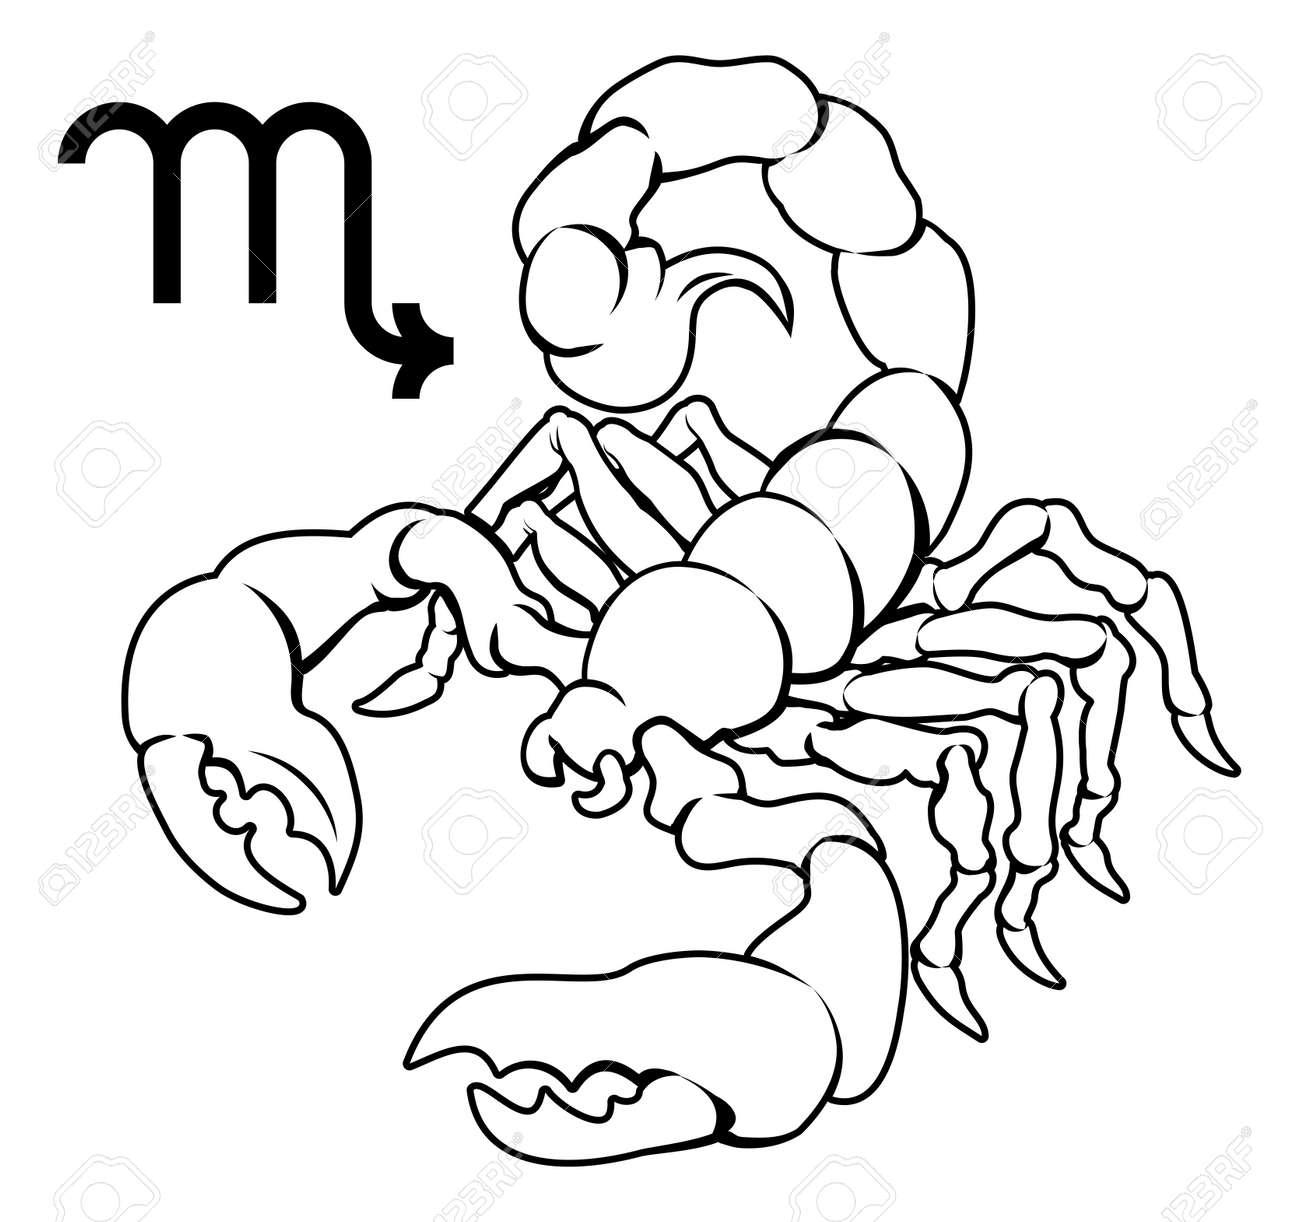 Illustration of  Scorpio the scorpion zodiac horoscope astrology sign Stock Vector - 23383270